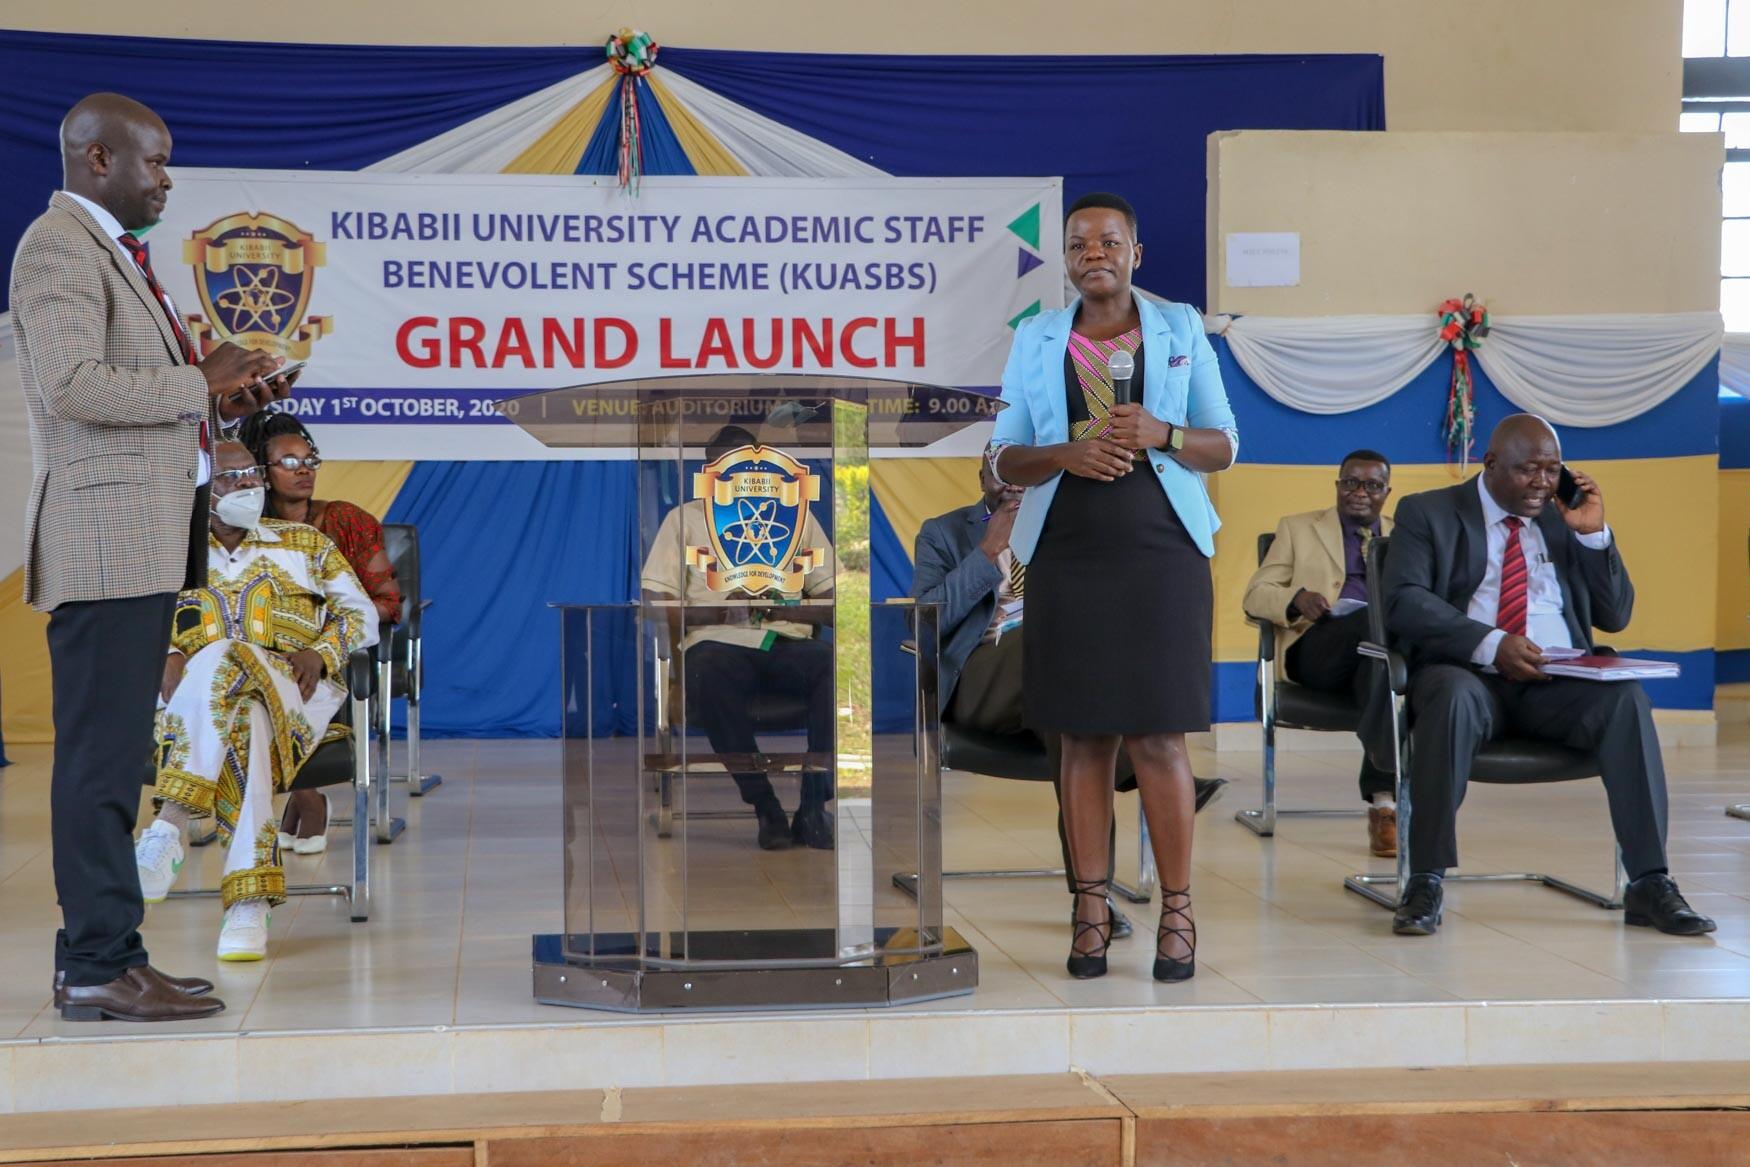 Academic Staff Benevolent Scheme (KUASBS) Grand Launch Album1